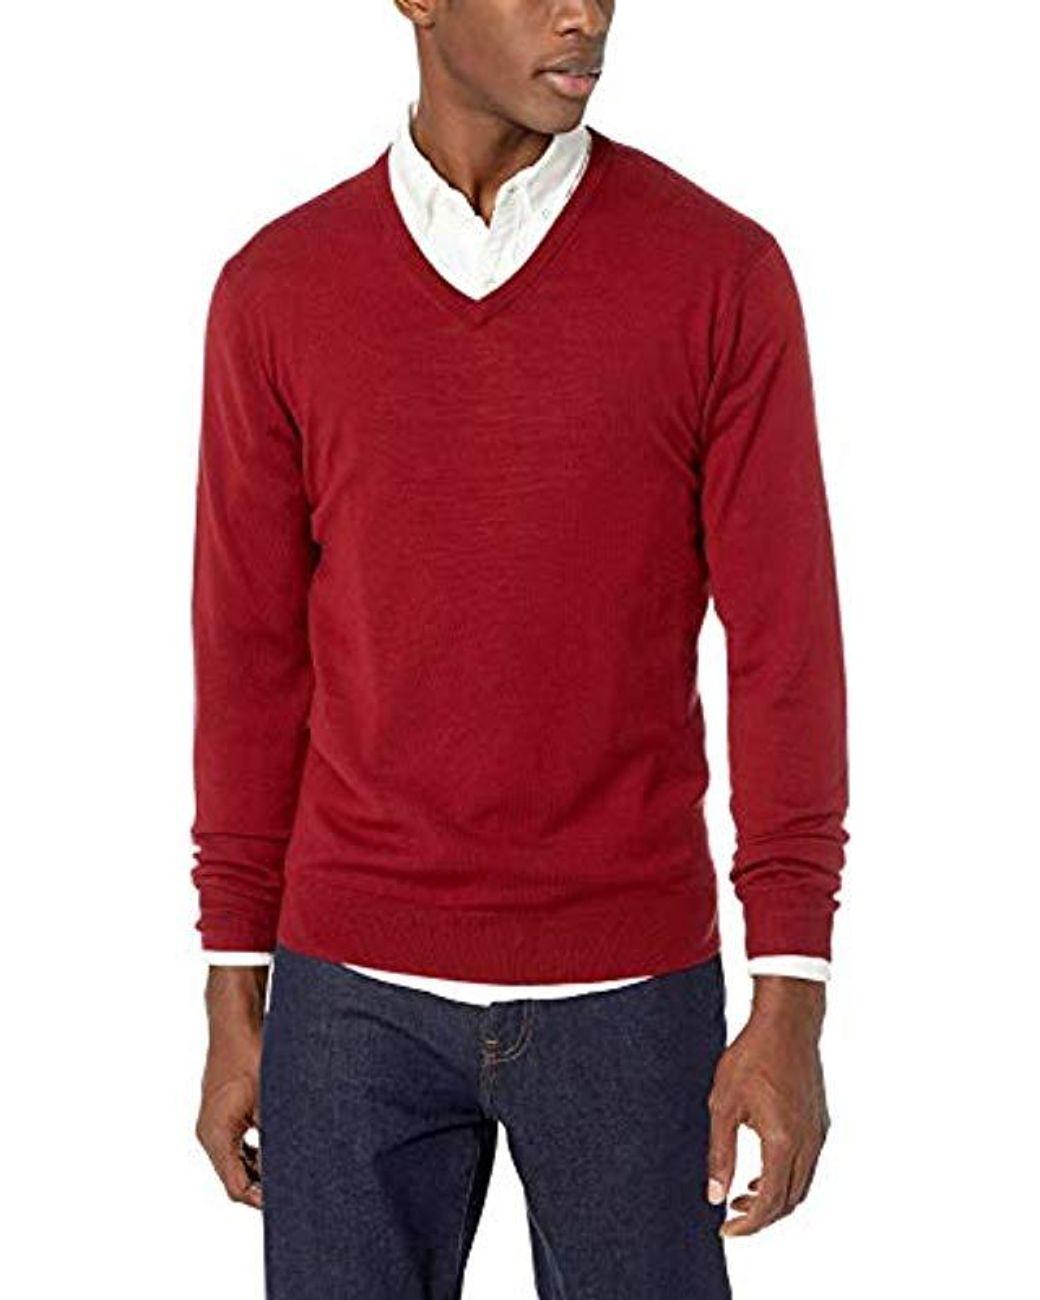 Brand Goodthreads Mens Merino Wool Crewneck Sweater